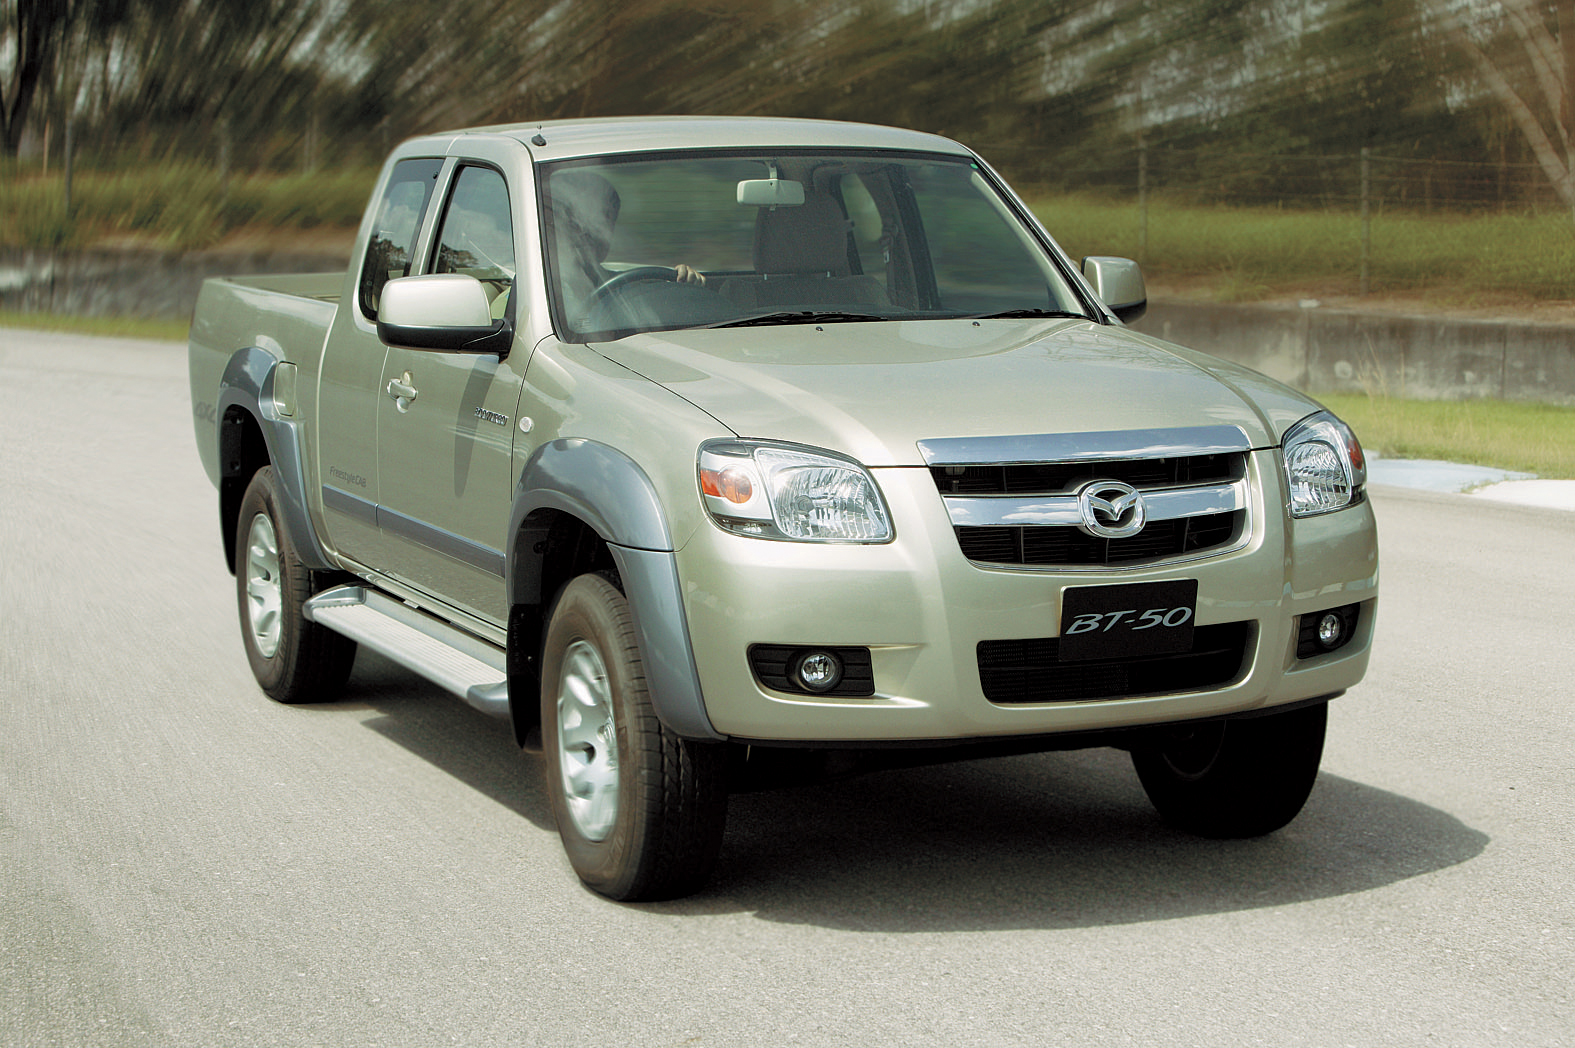 2006 Mazda BT-50 - Picture 53164